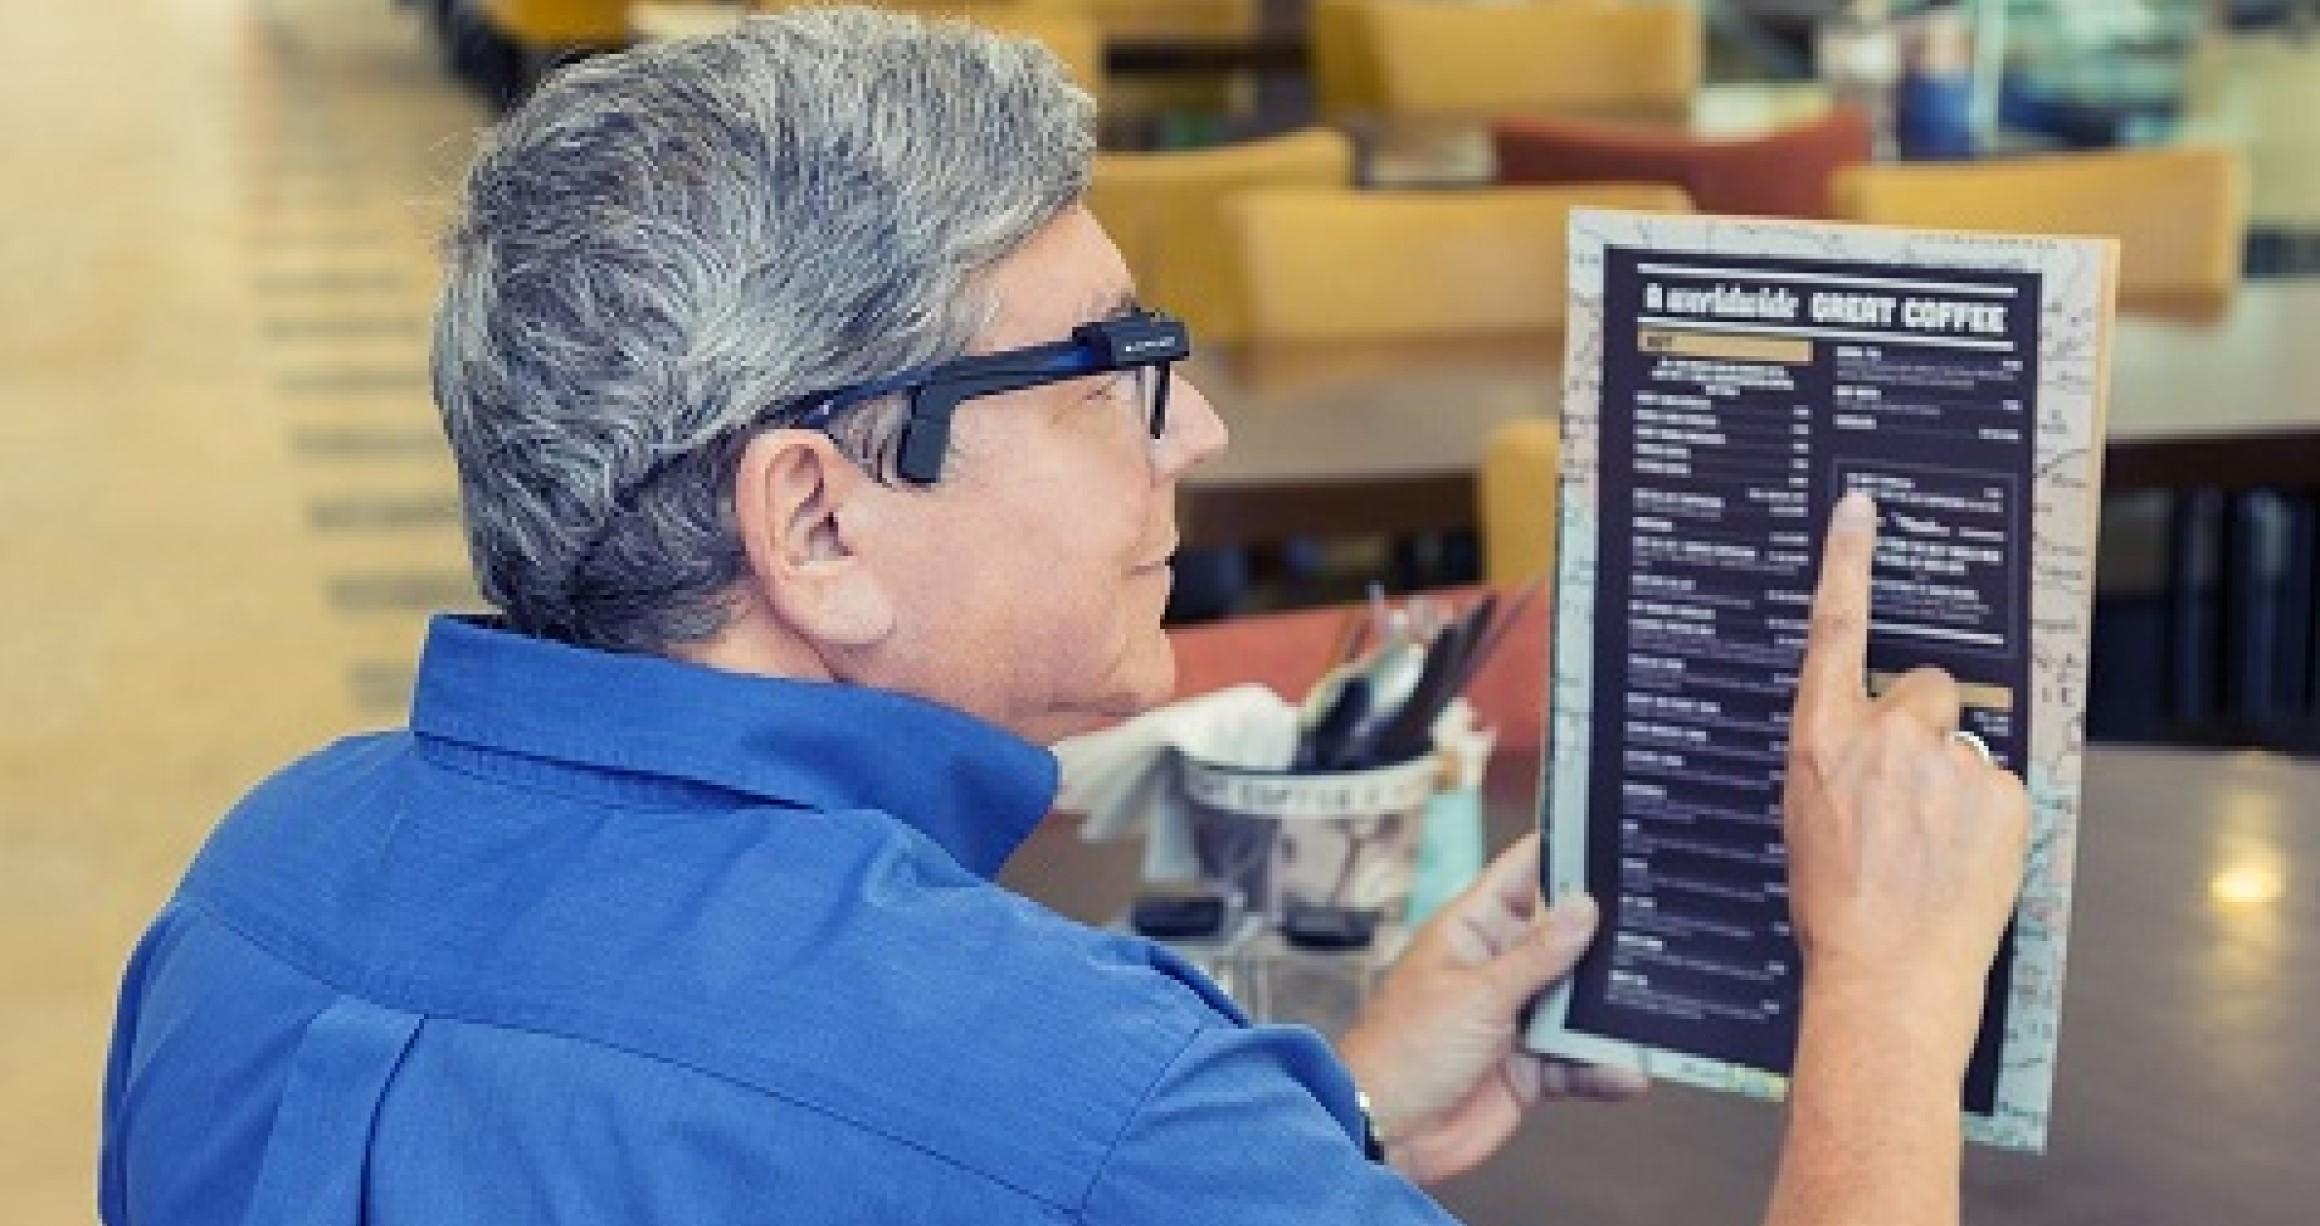 Man reading a menu